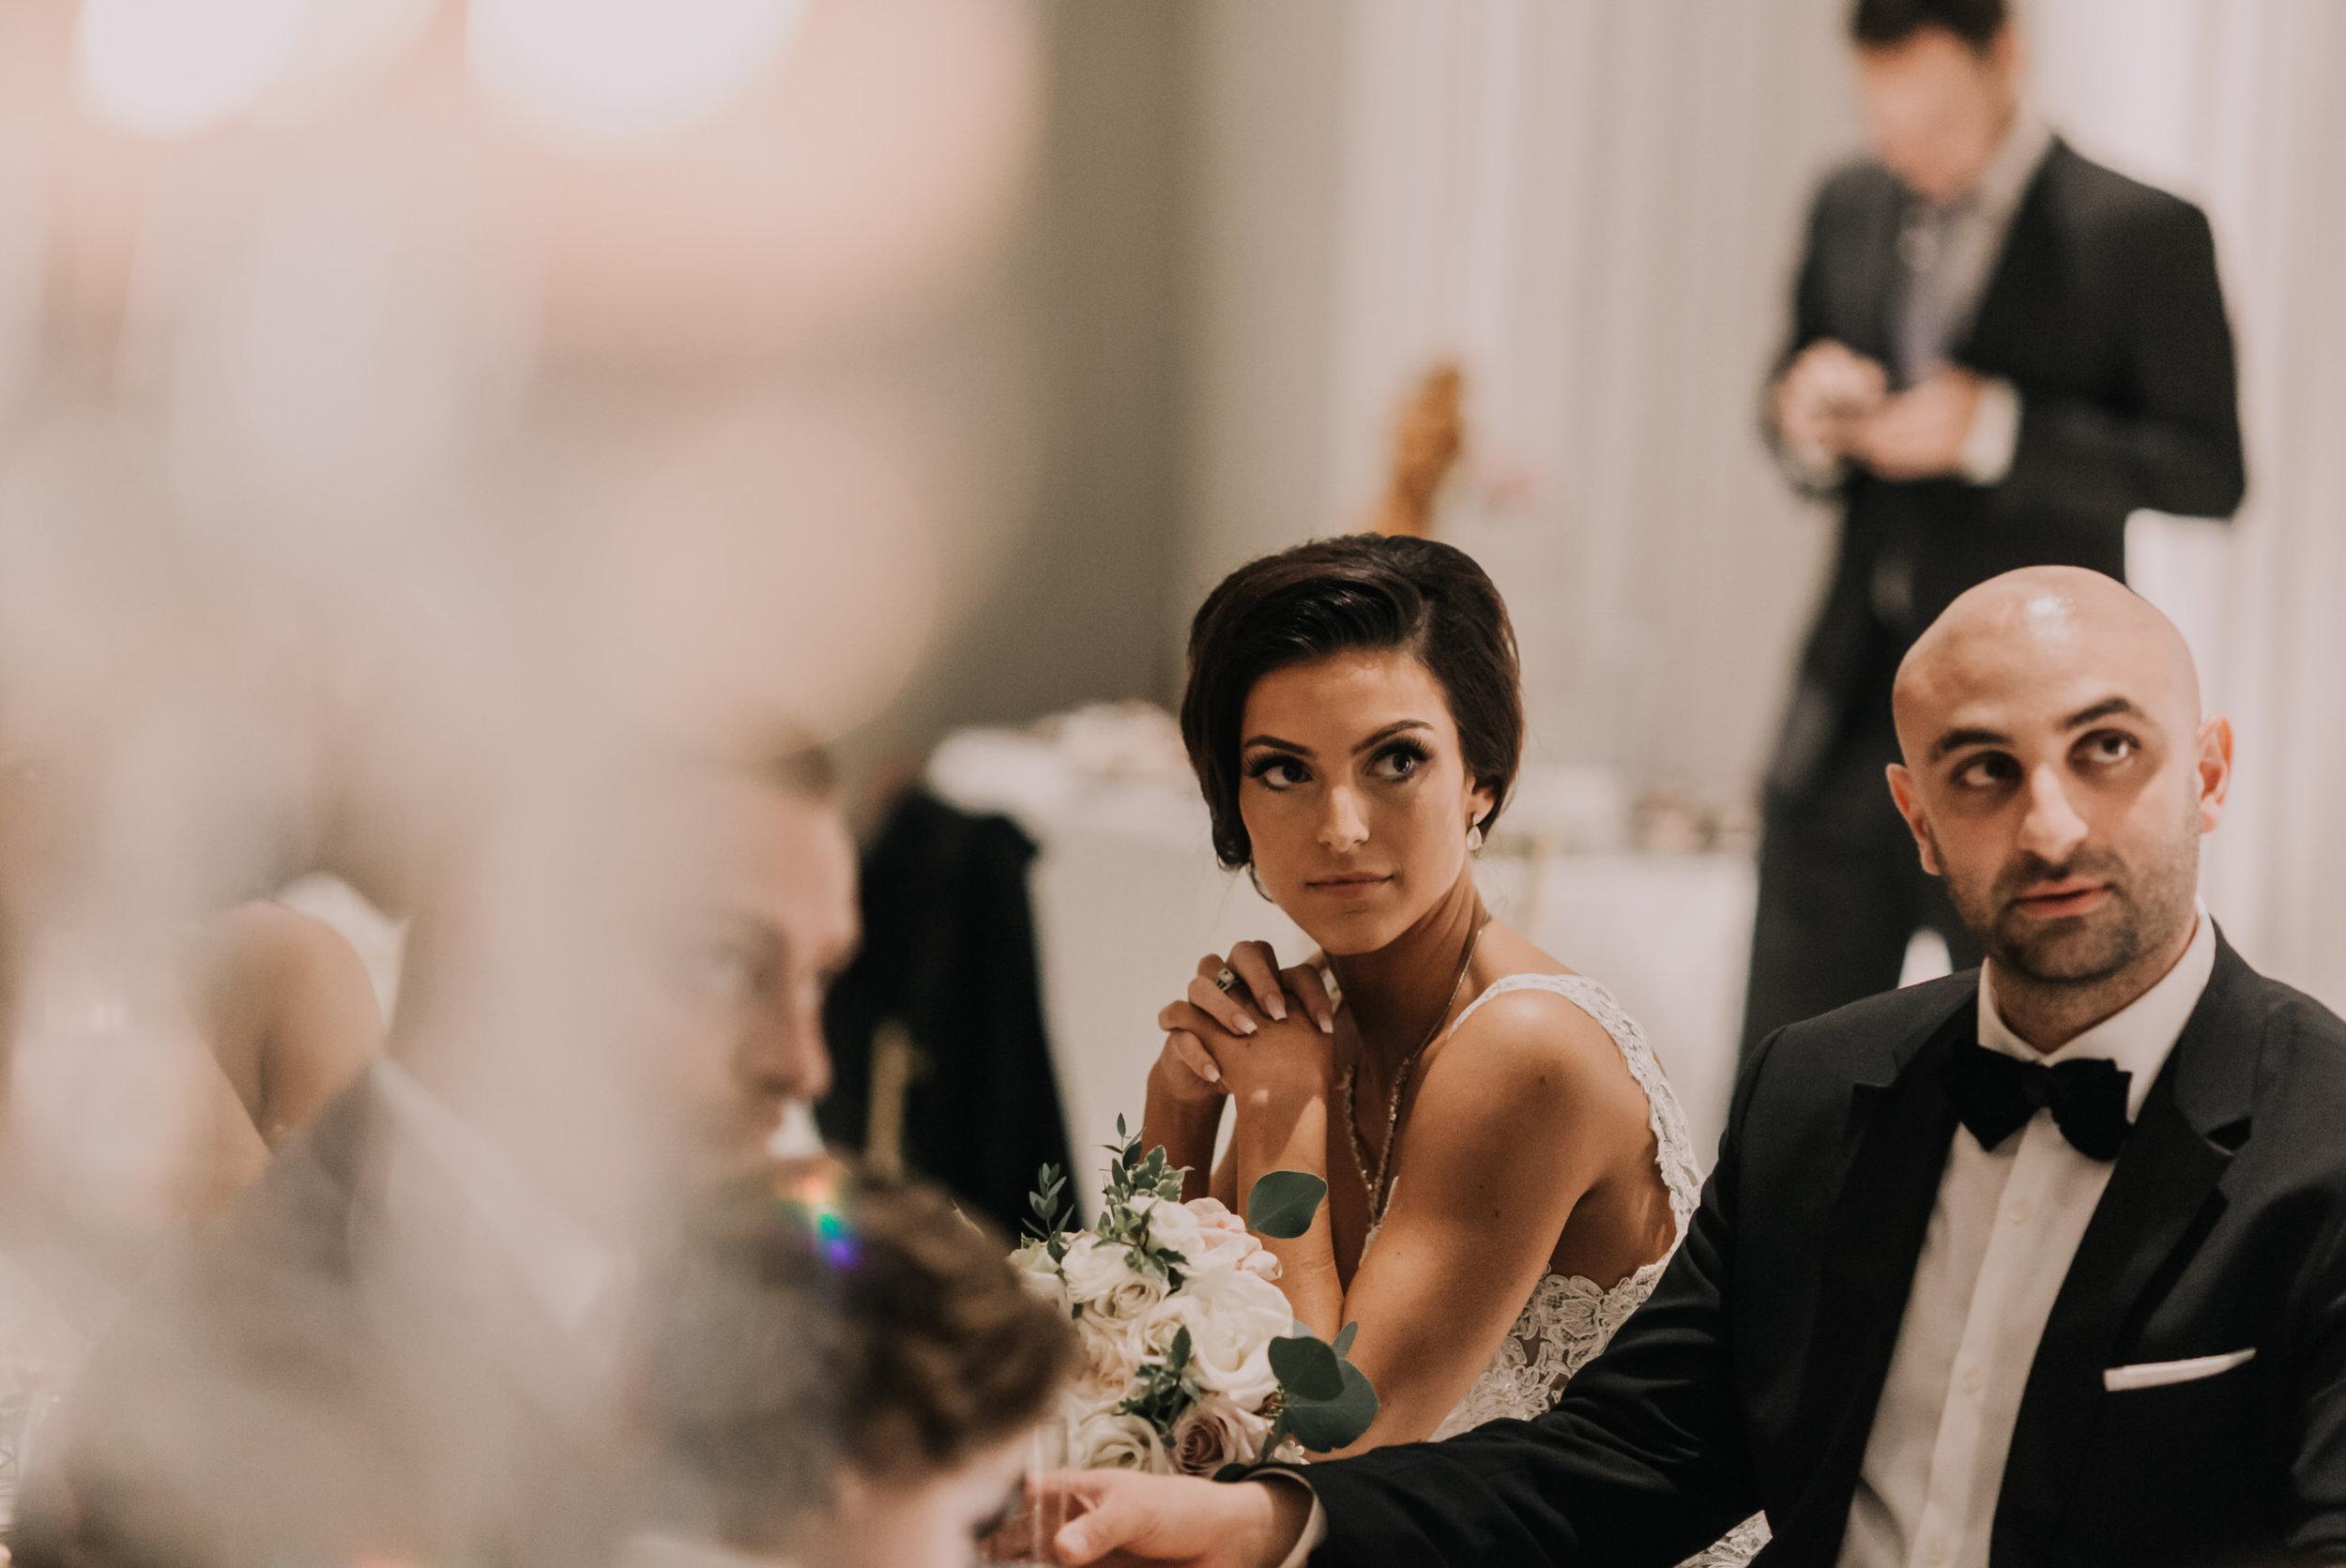 Pitt Meadows Wedding Photographer - Sky Hangar Wedding Photos - Vancouver Wedding Photographer & Videographer - Sunshine Coast Wedding Photos - Sunshine Coast Wedding Photographer - Jennifer Picard Photography - IMG_6405.jpg